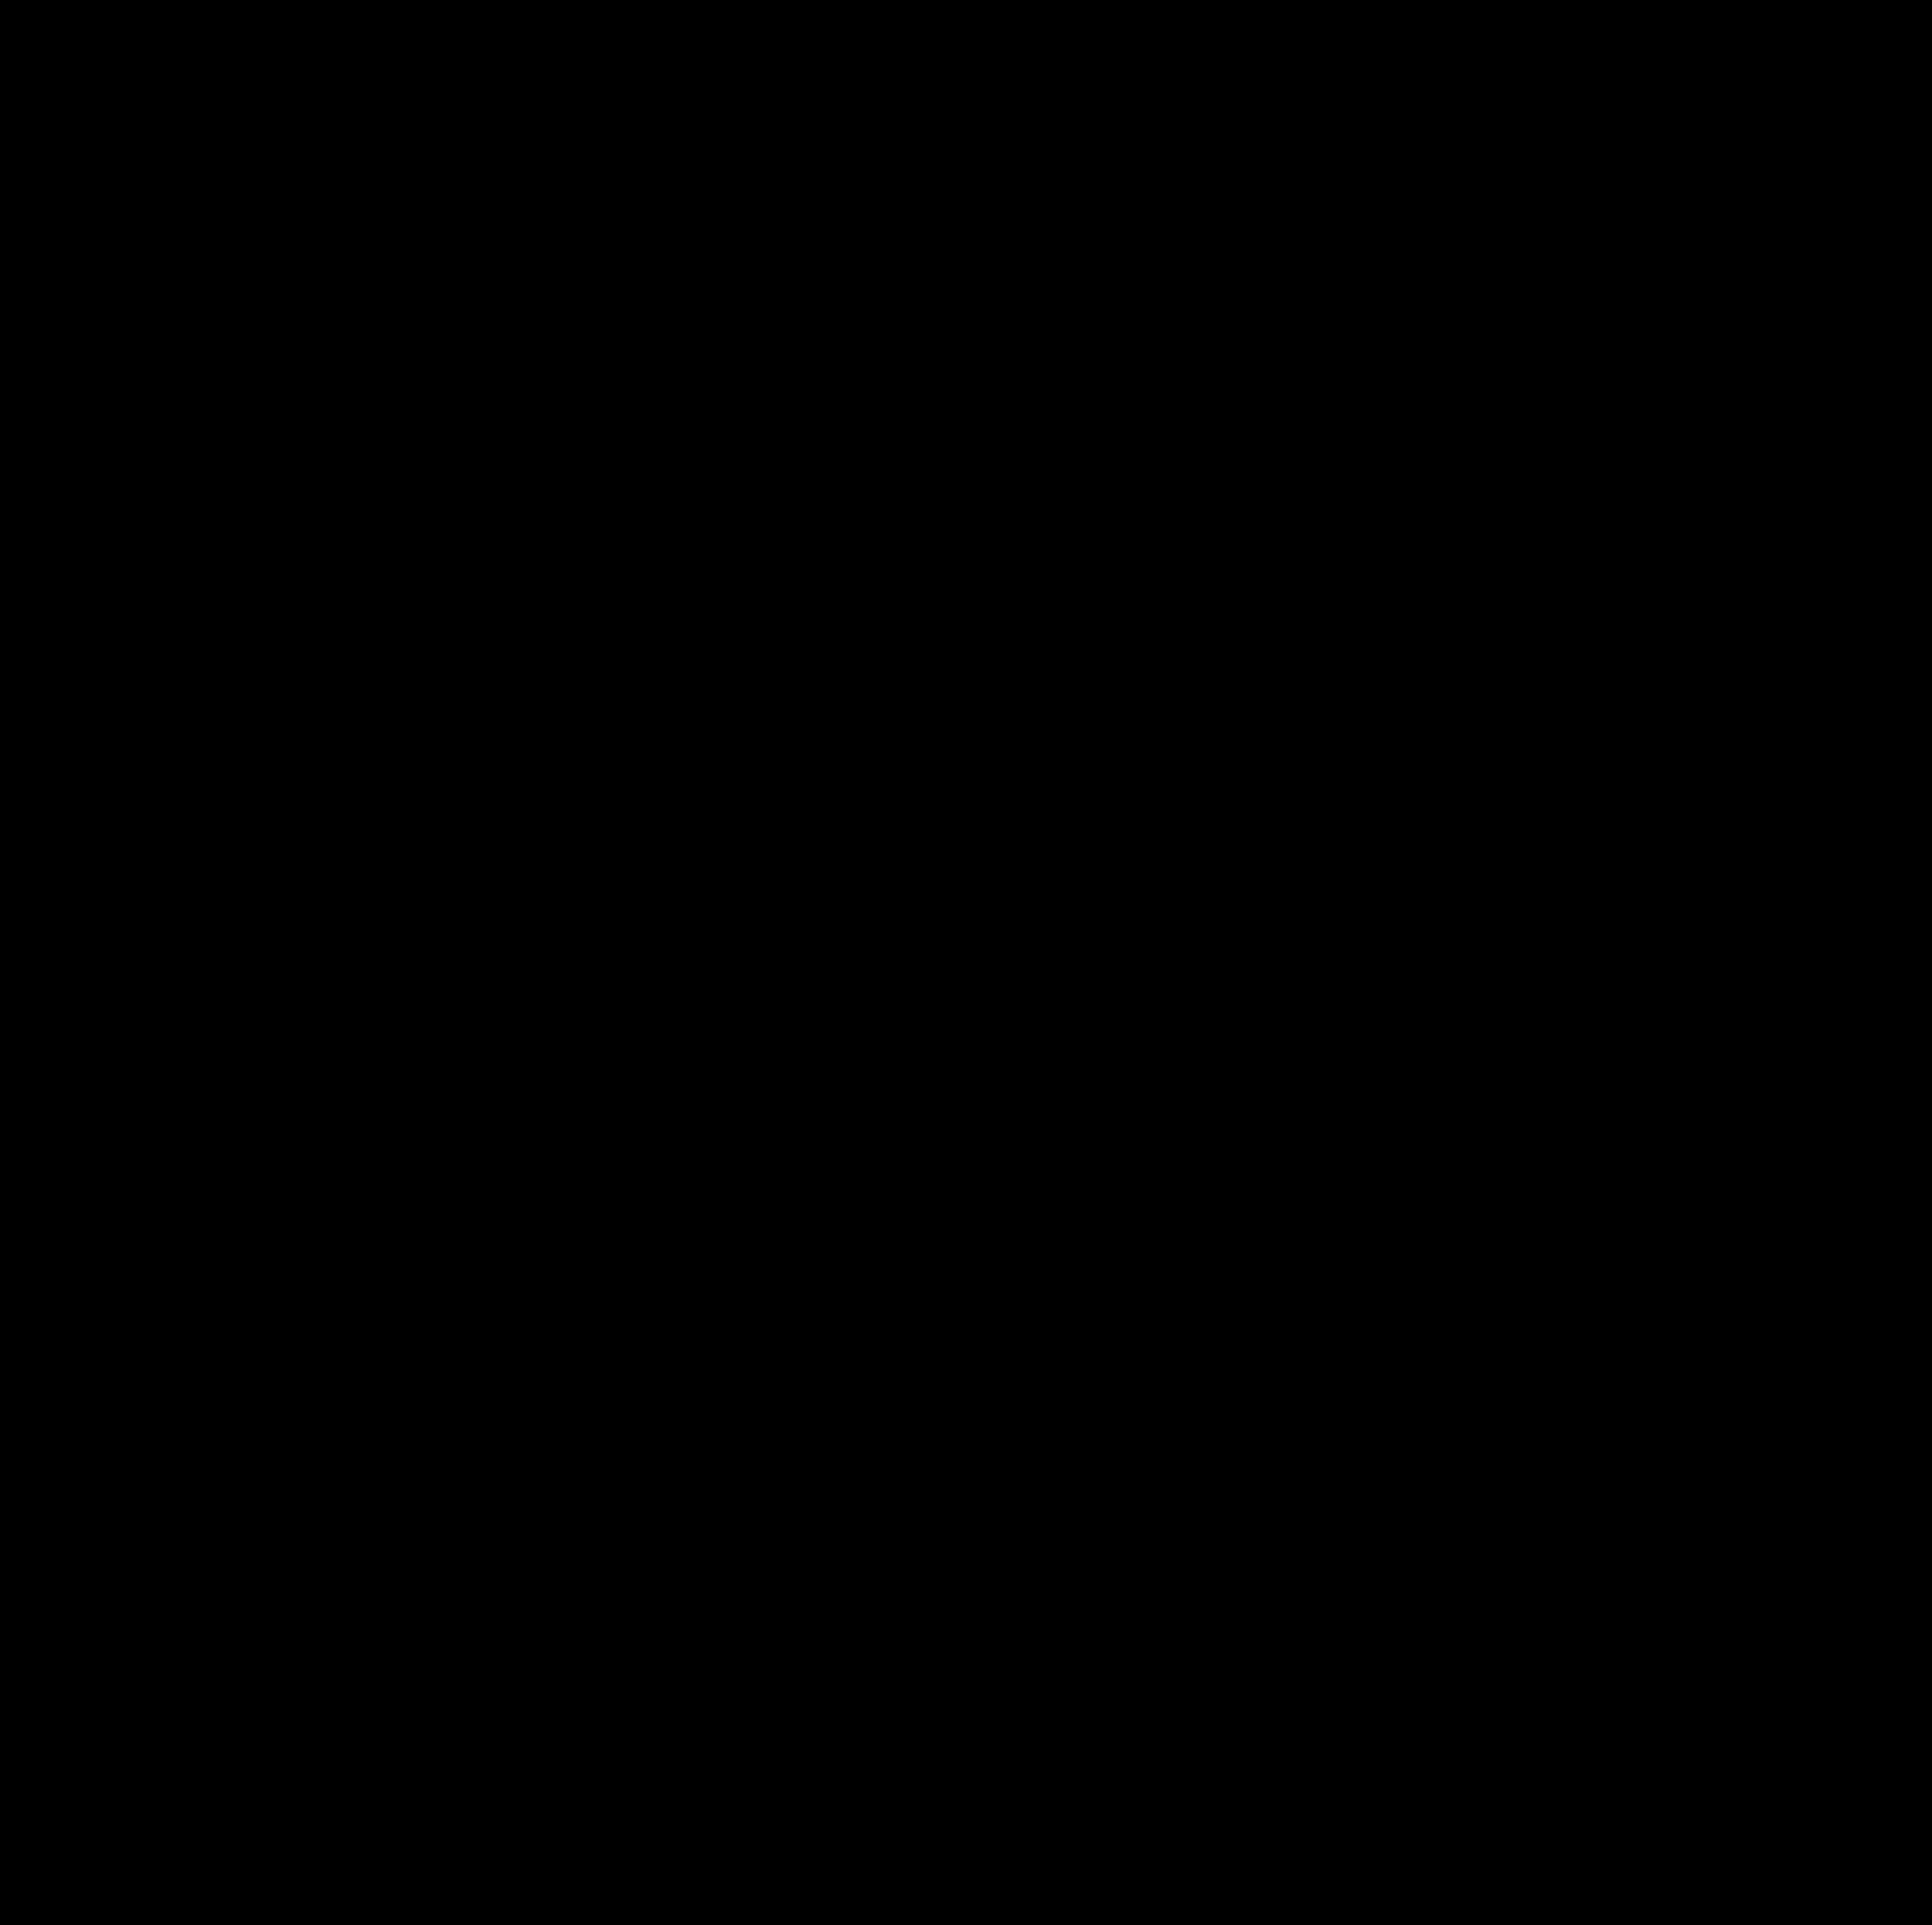 banner transparent stock Clipart